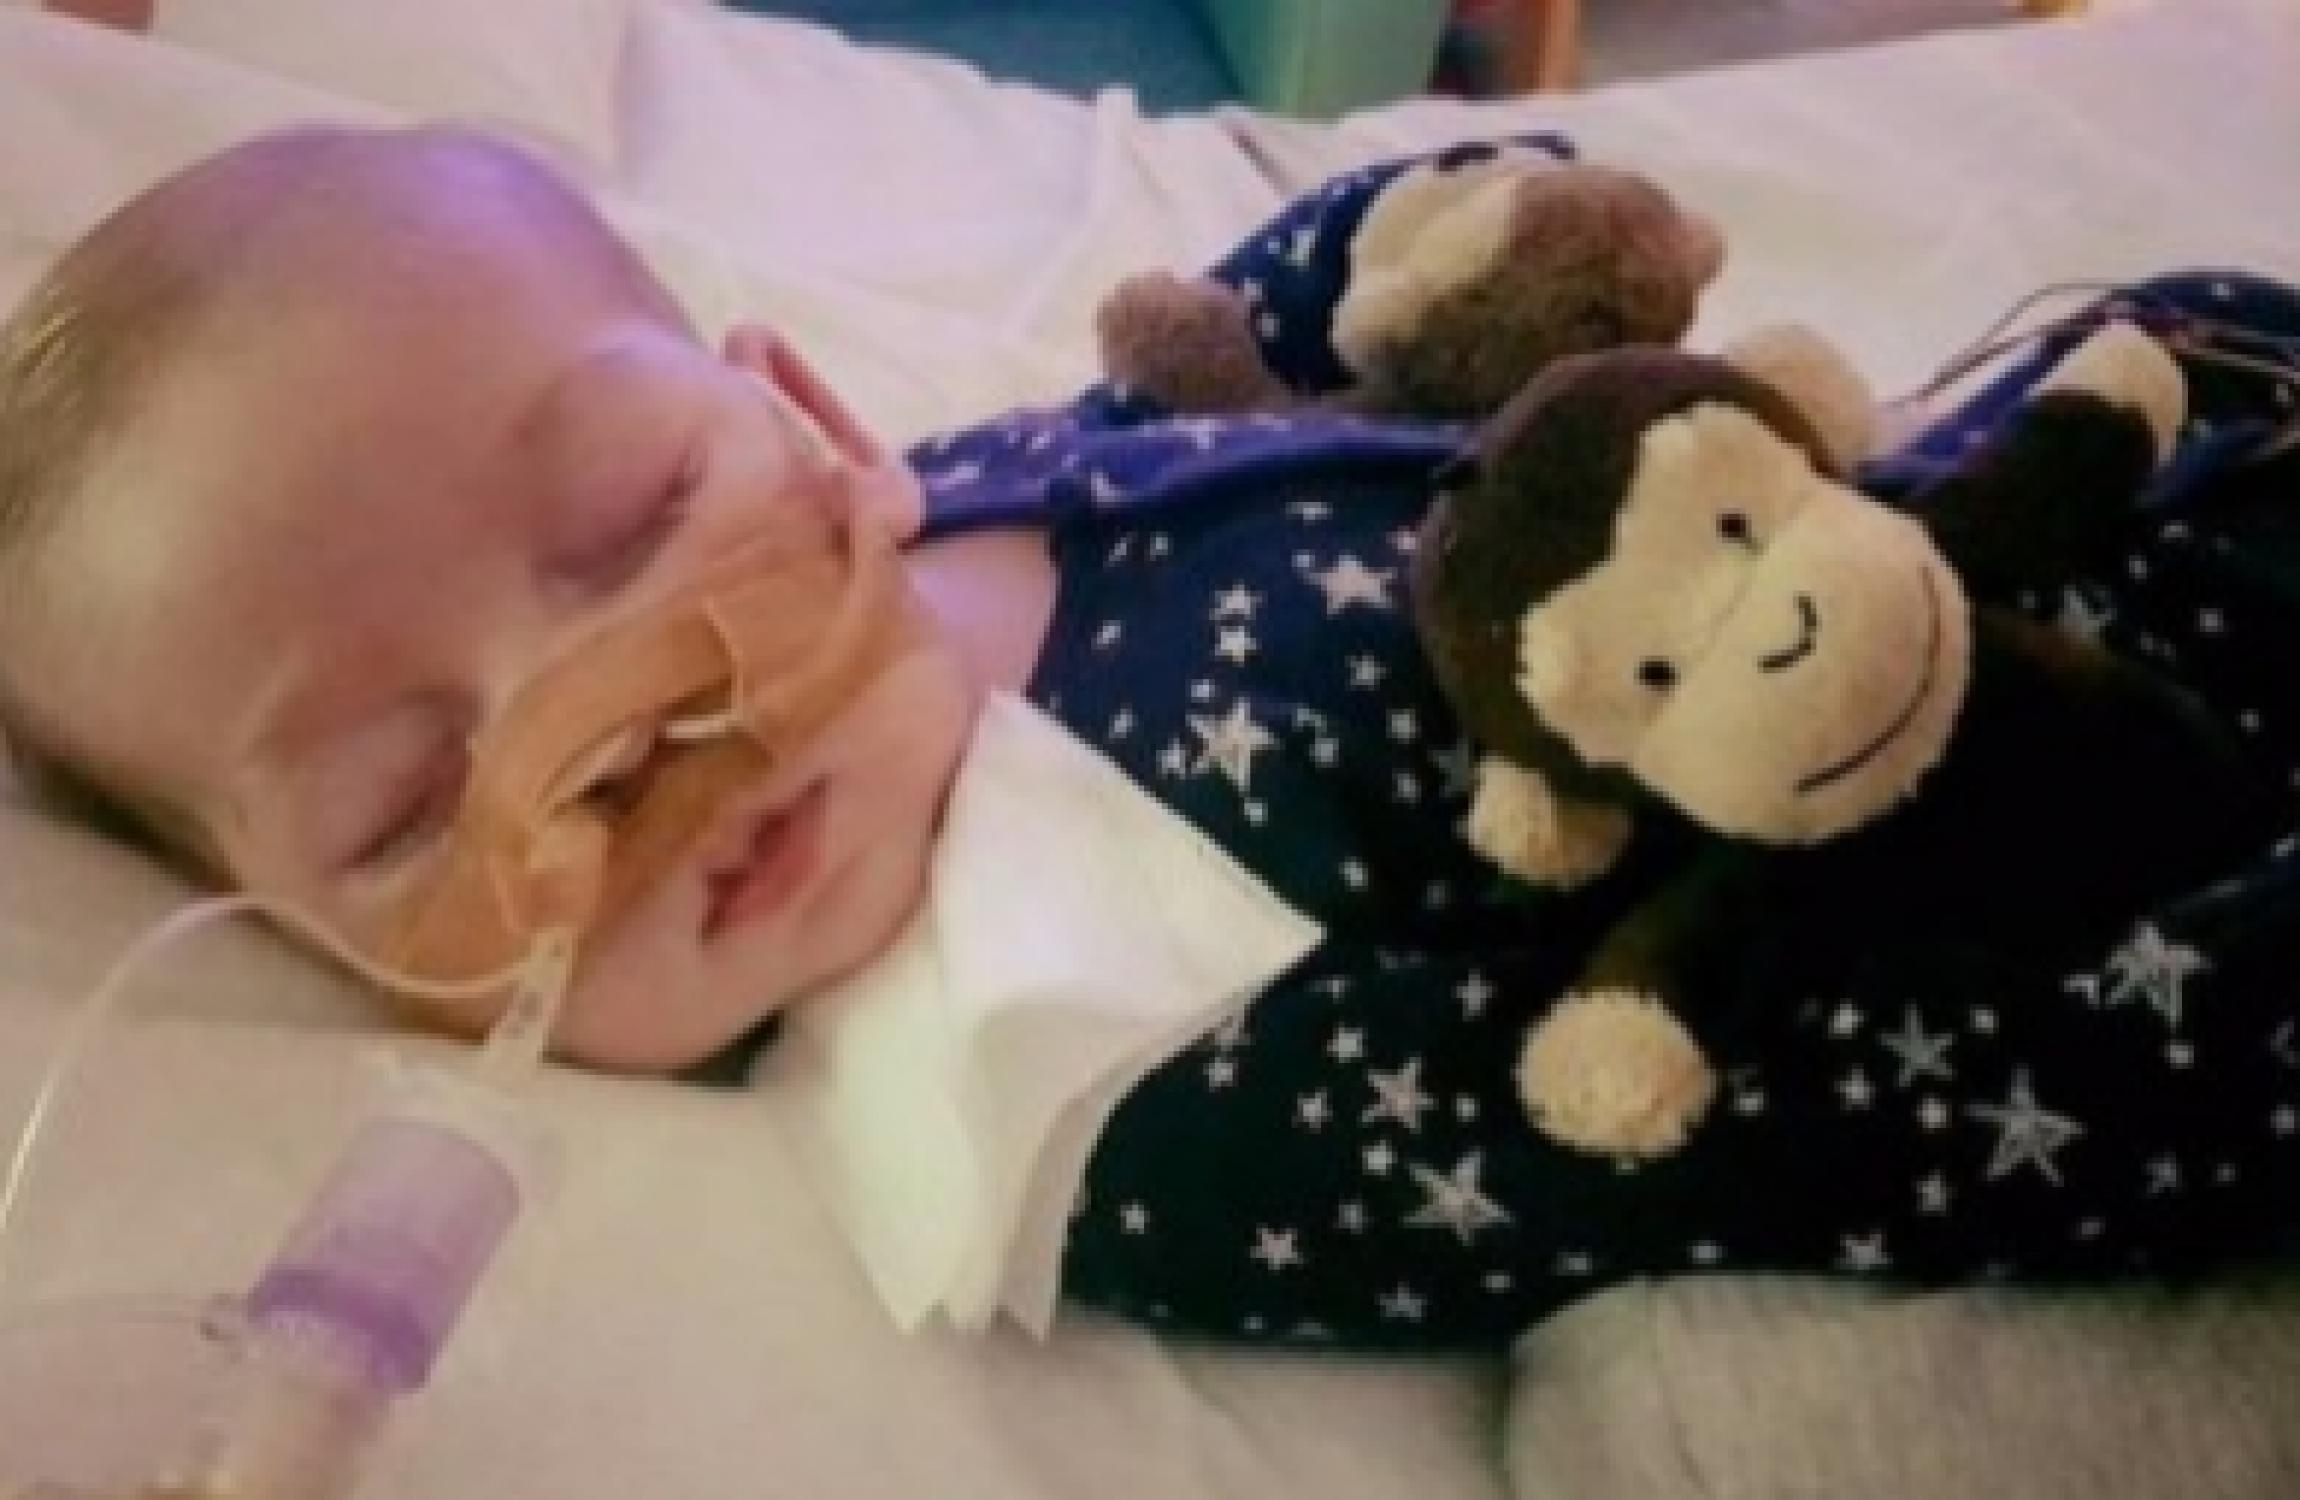 European court refuses to intervene over sick British baby